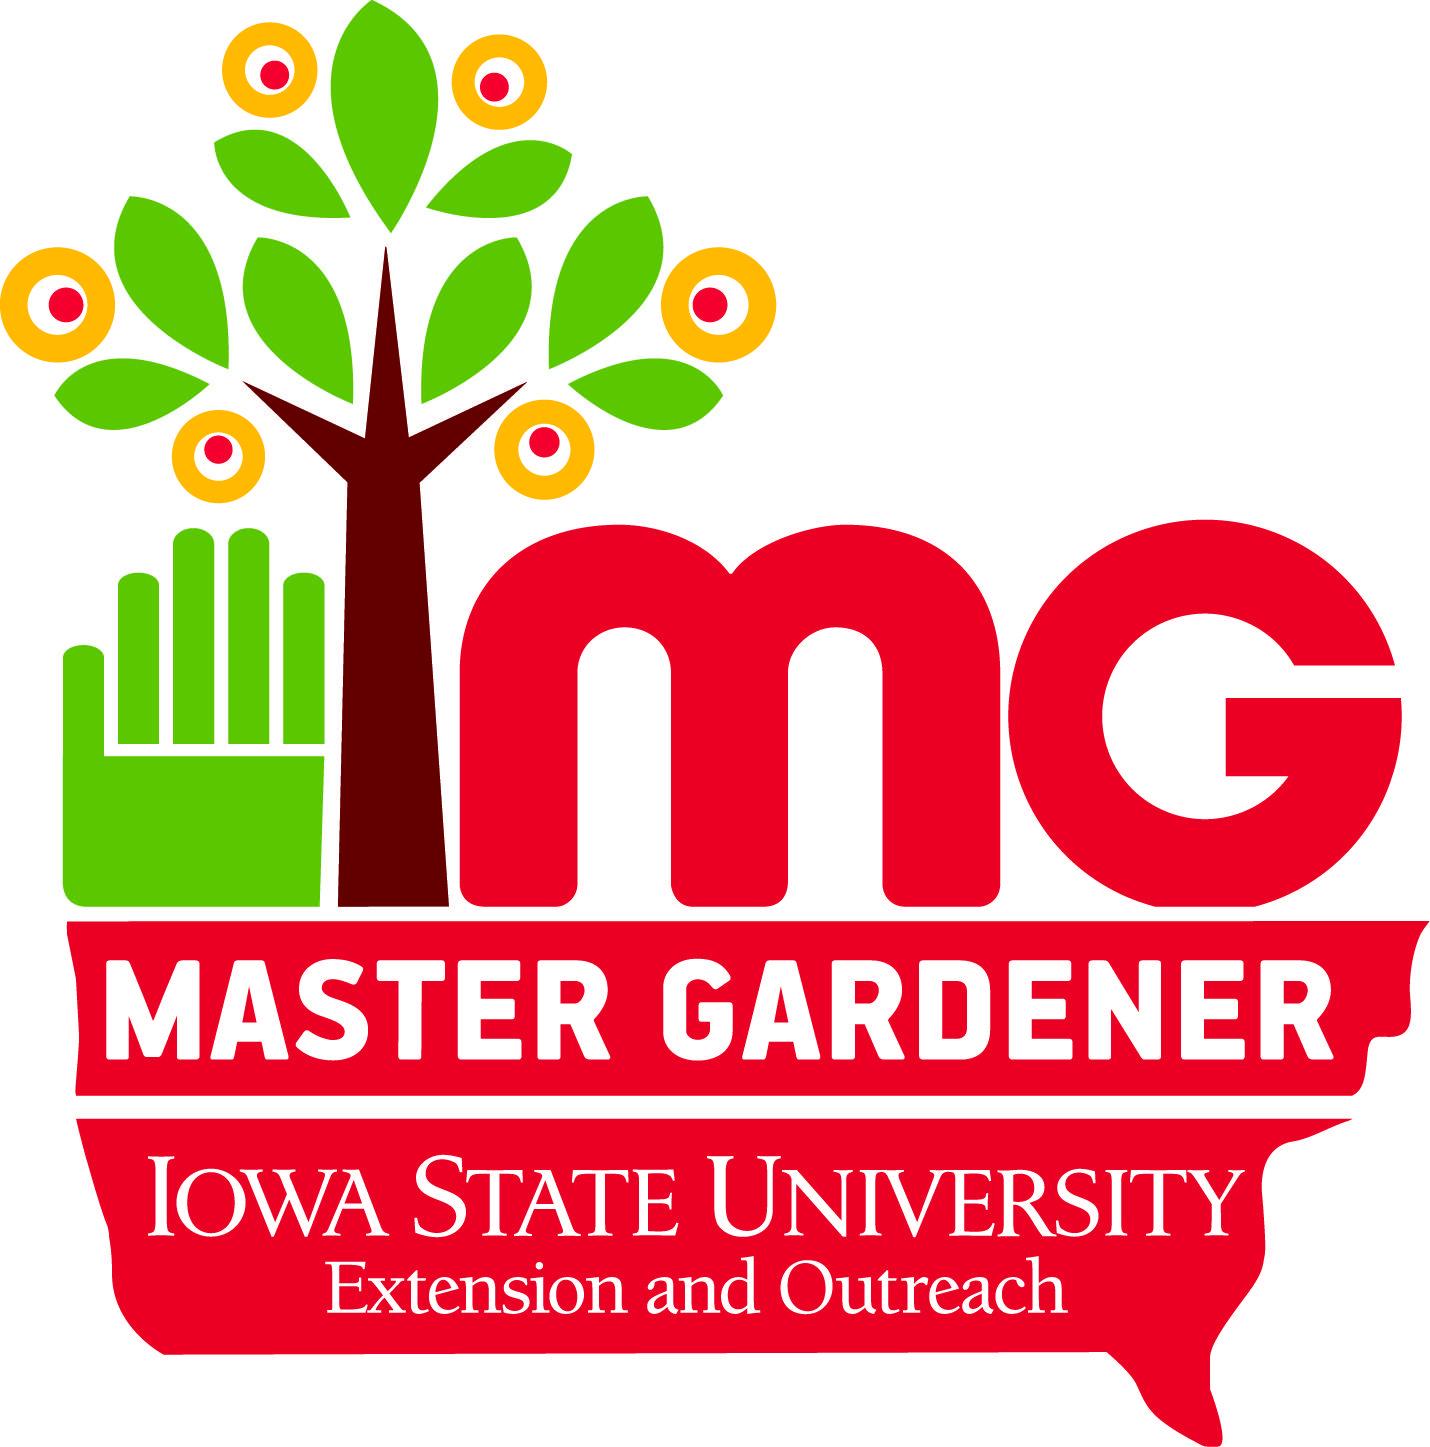 Amazing Master Gardeners: Growing Community